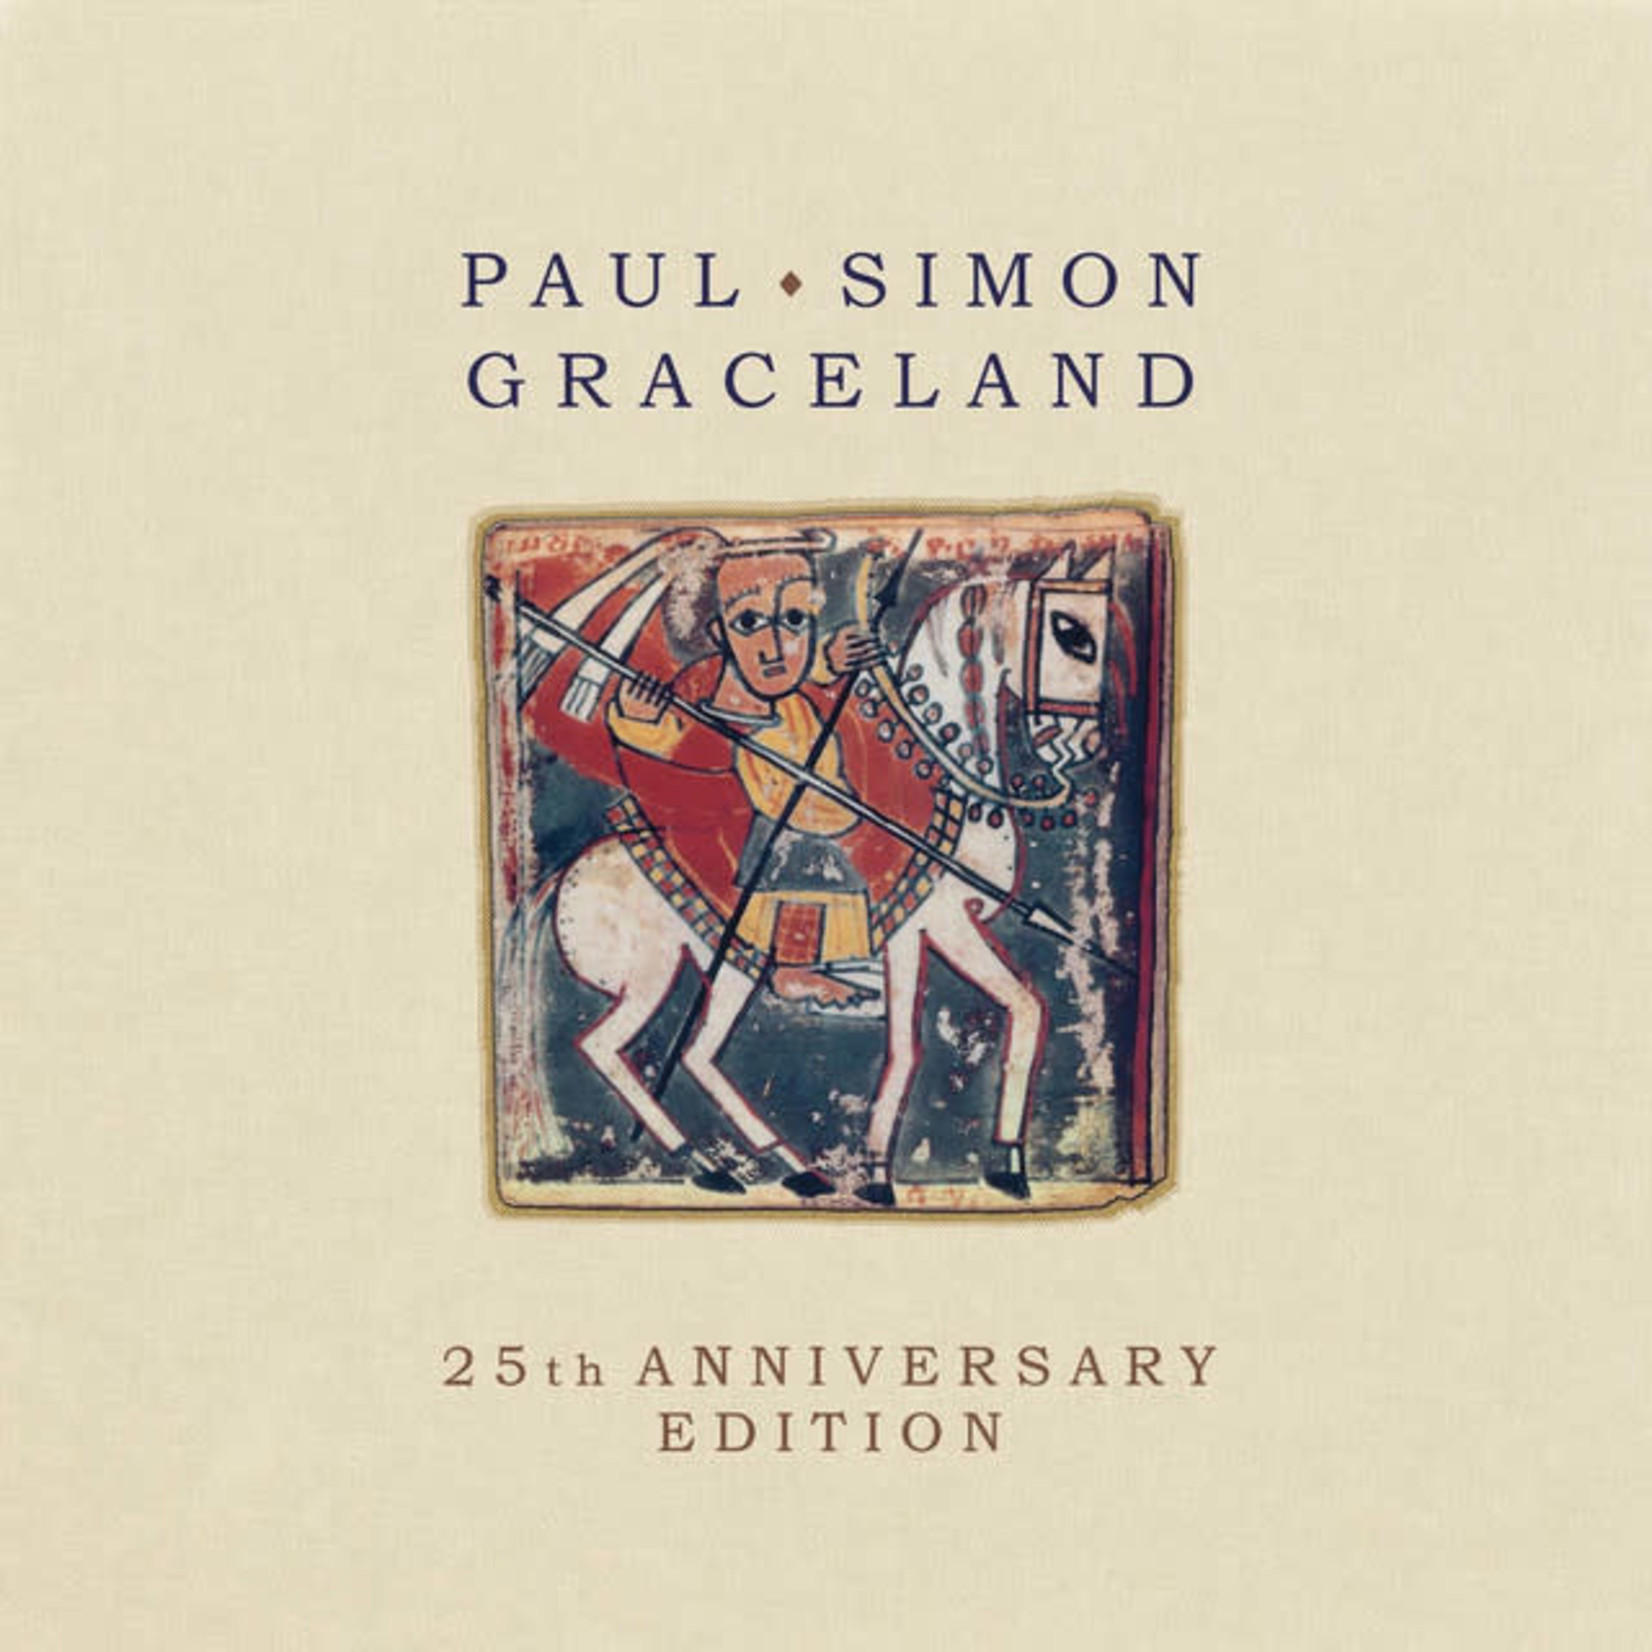 Vinyl Paul Simon - Graceland